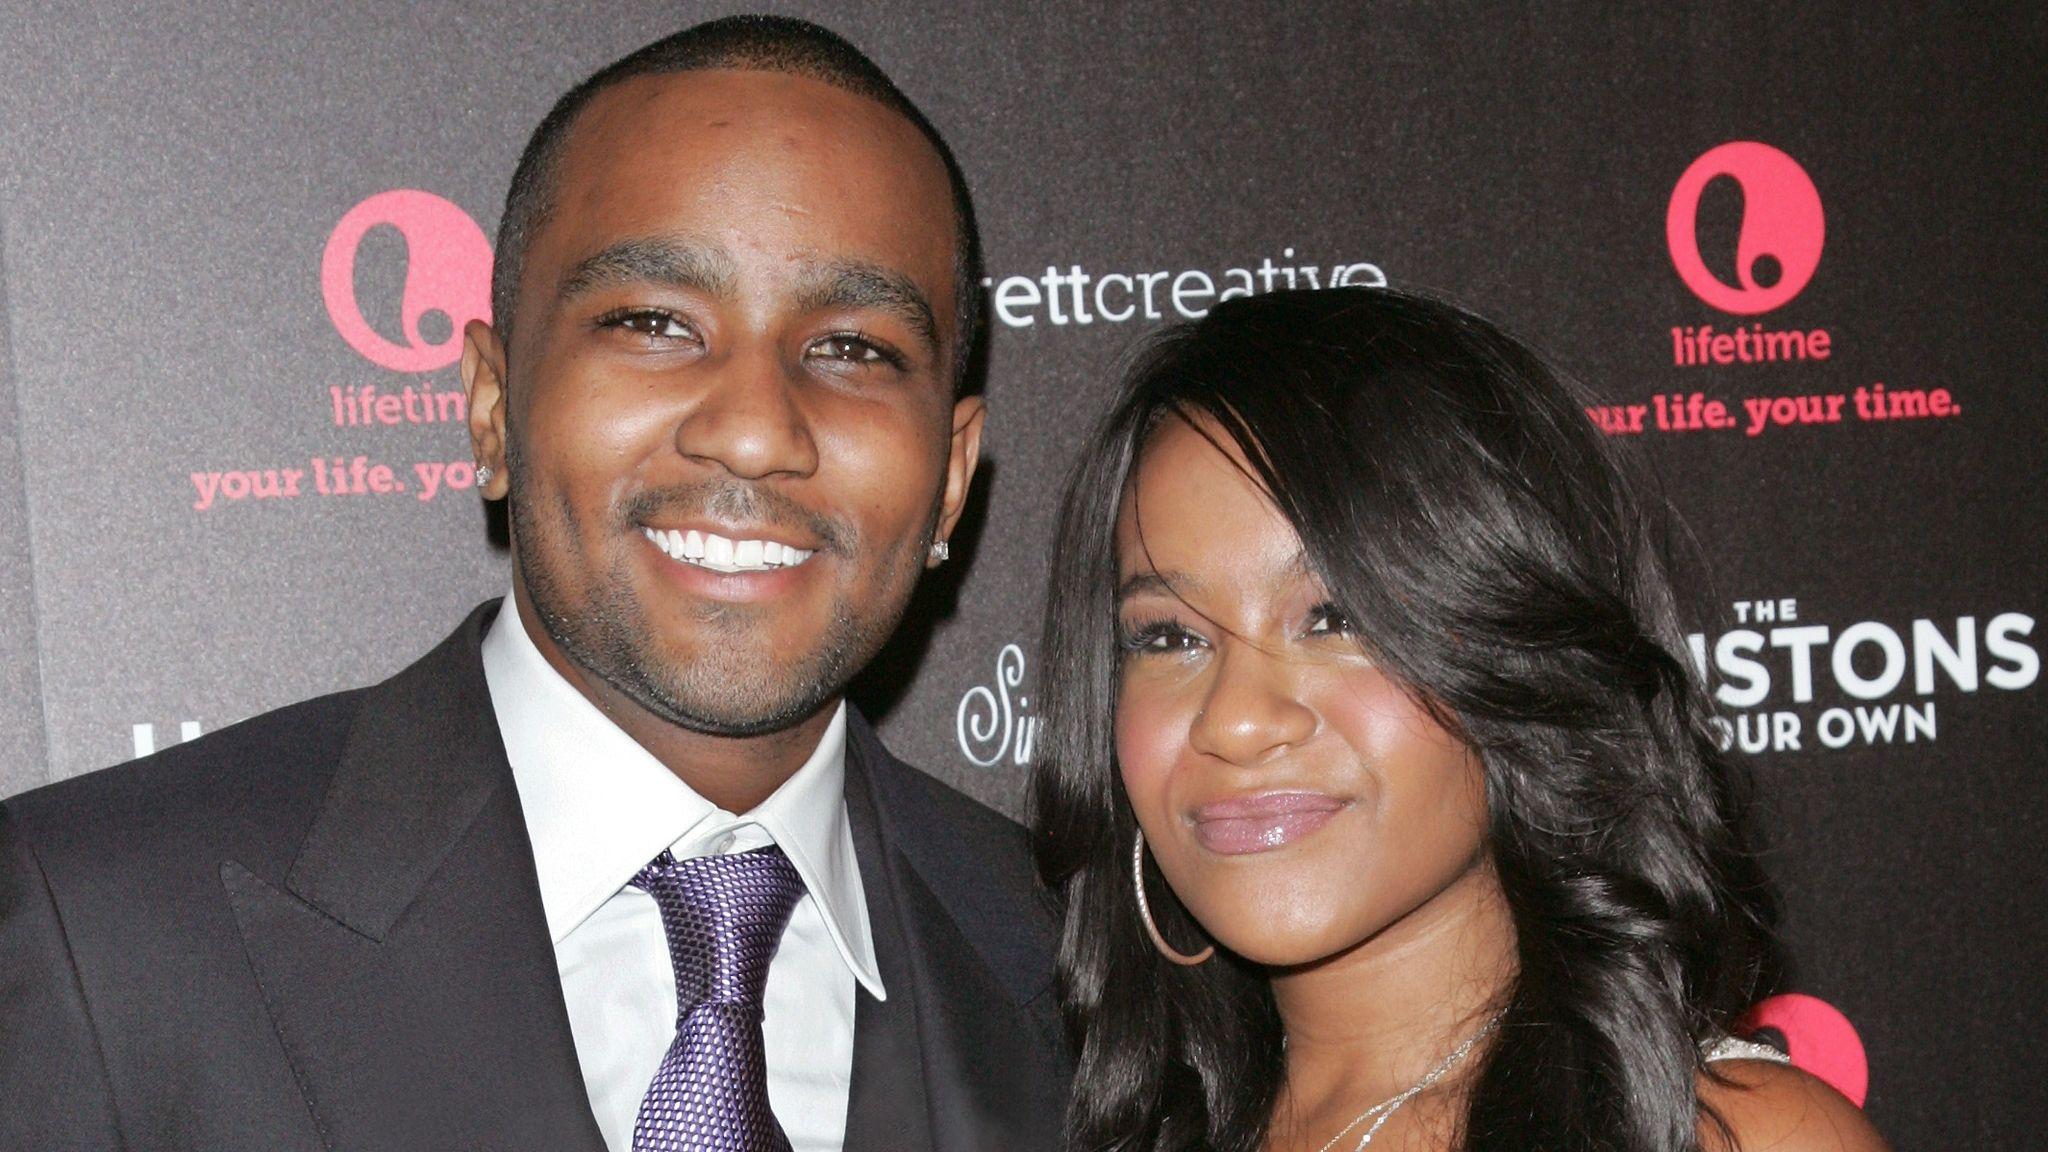 Brown Nick Of Bobbie Gordon Died Kristina Ex-partner